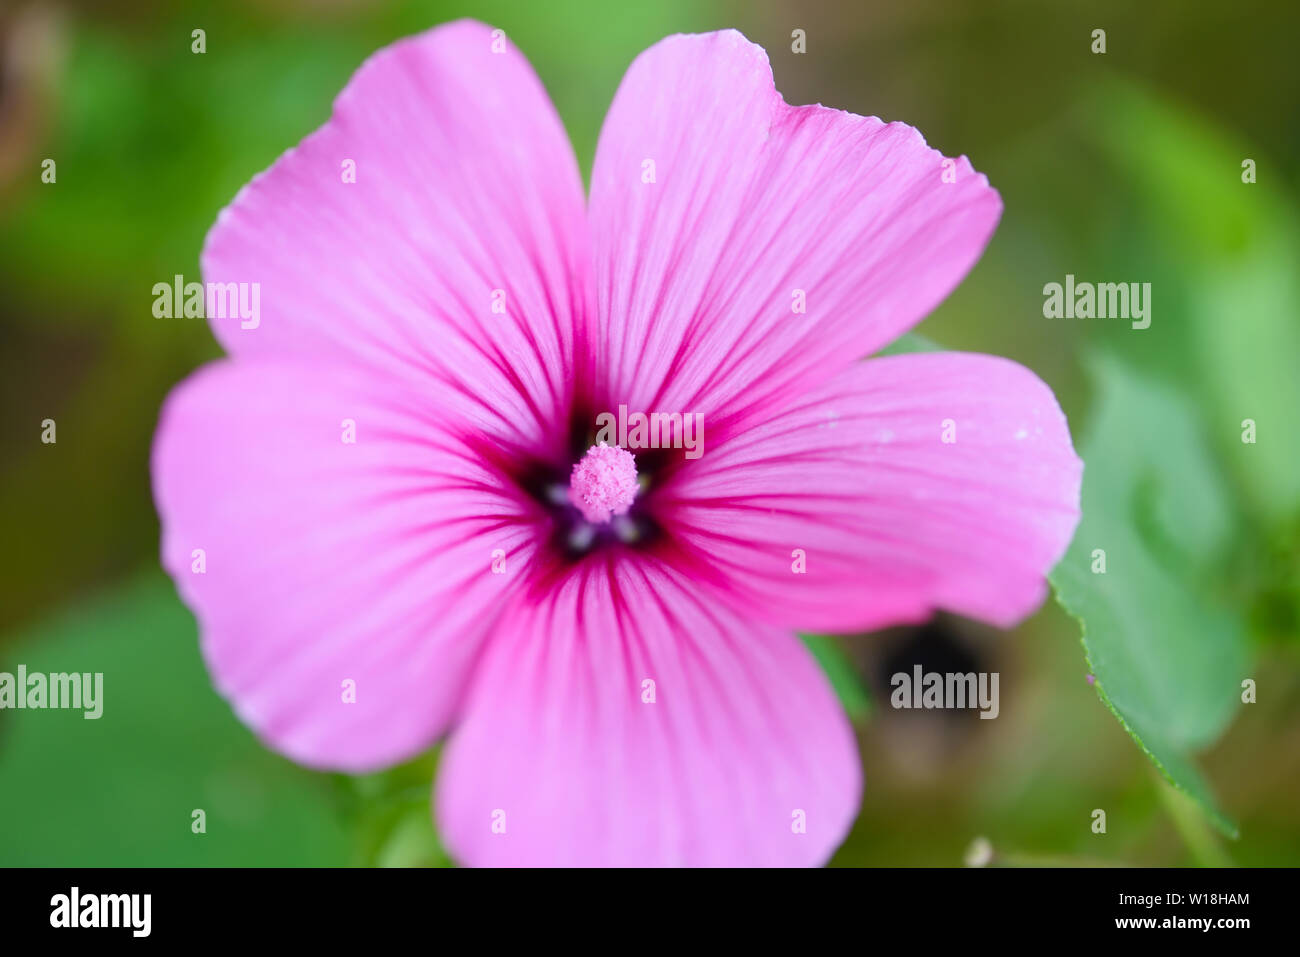 Pink blooming hollyhock mallow (Malva alcea) close-up Stock Photo